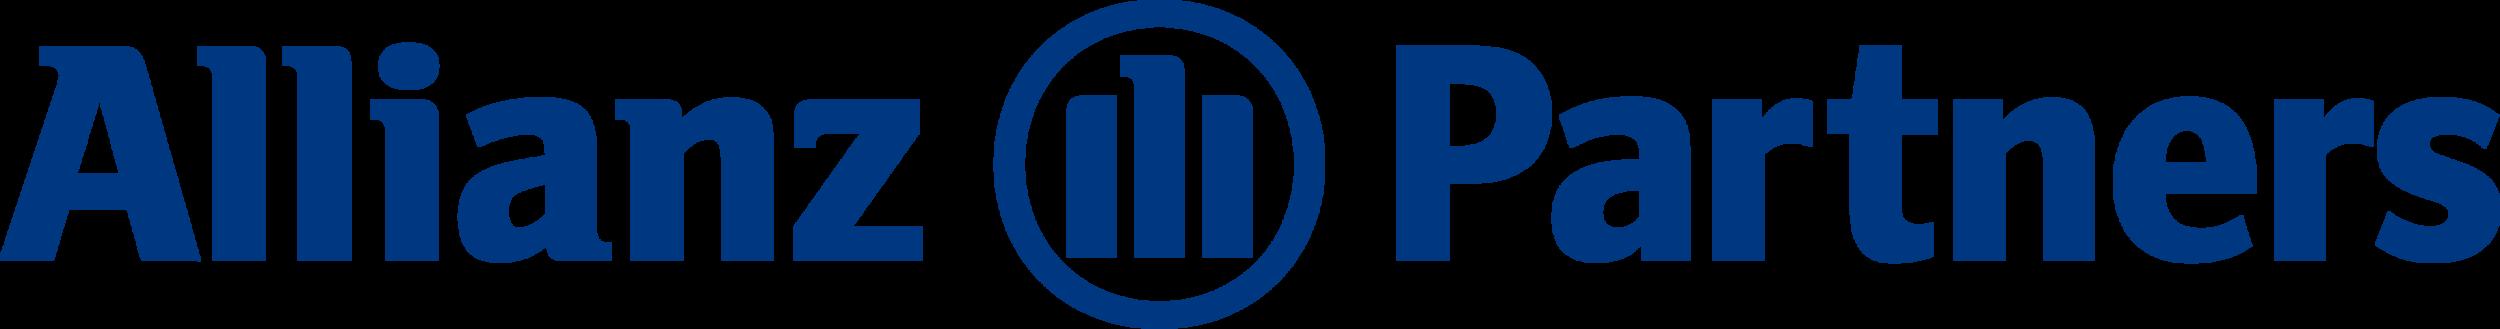 Allianz_Partners_RGB.png